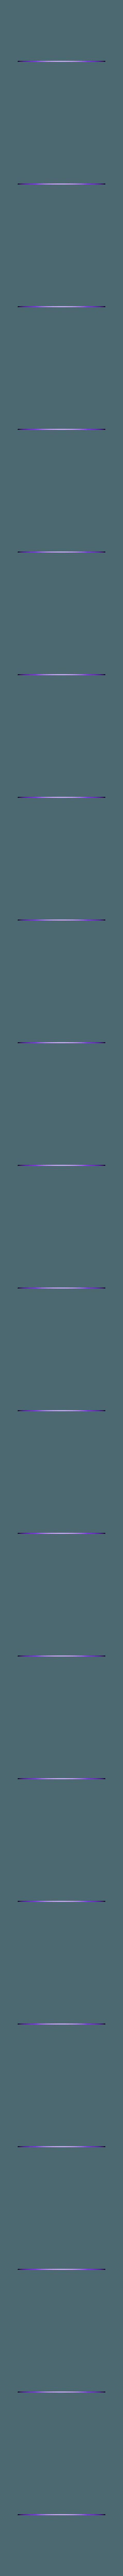 Suns_white.STL Download free STL file Minimal Multi-color NBA coasters • 3D print object, MosaicManufacturing